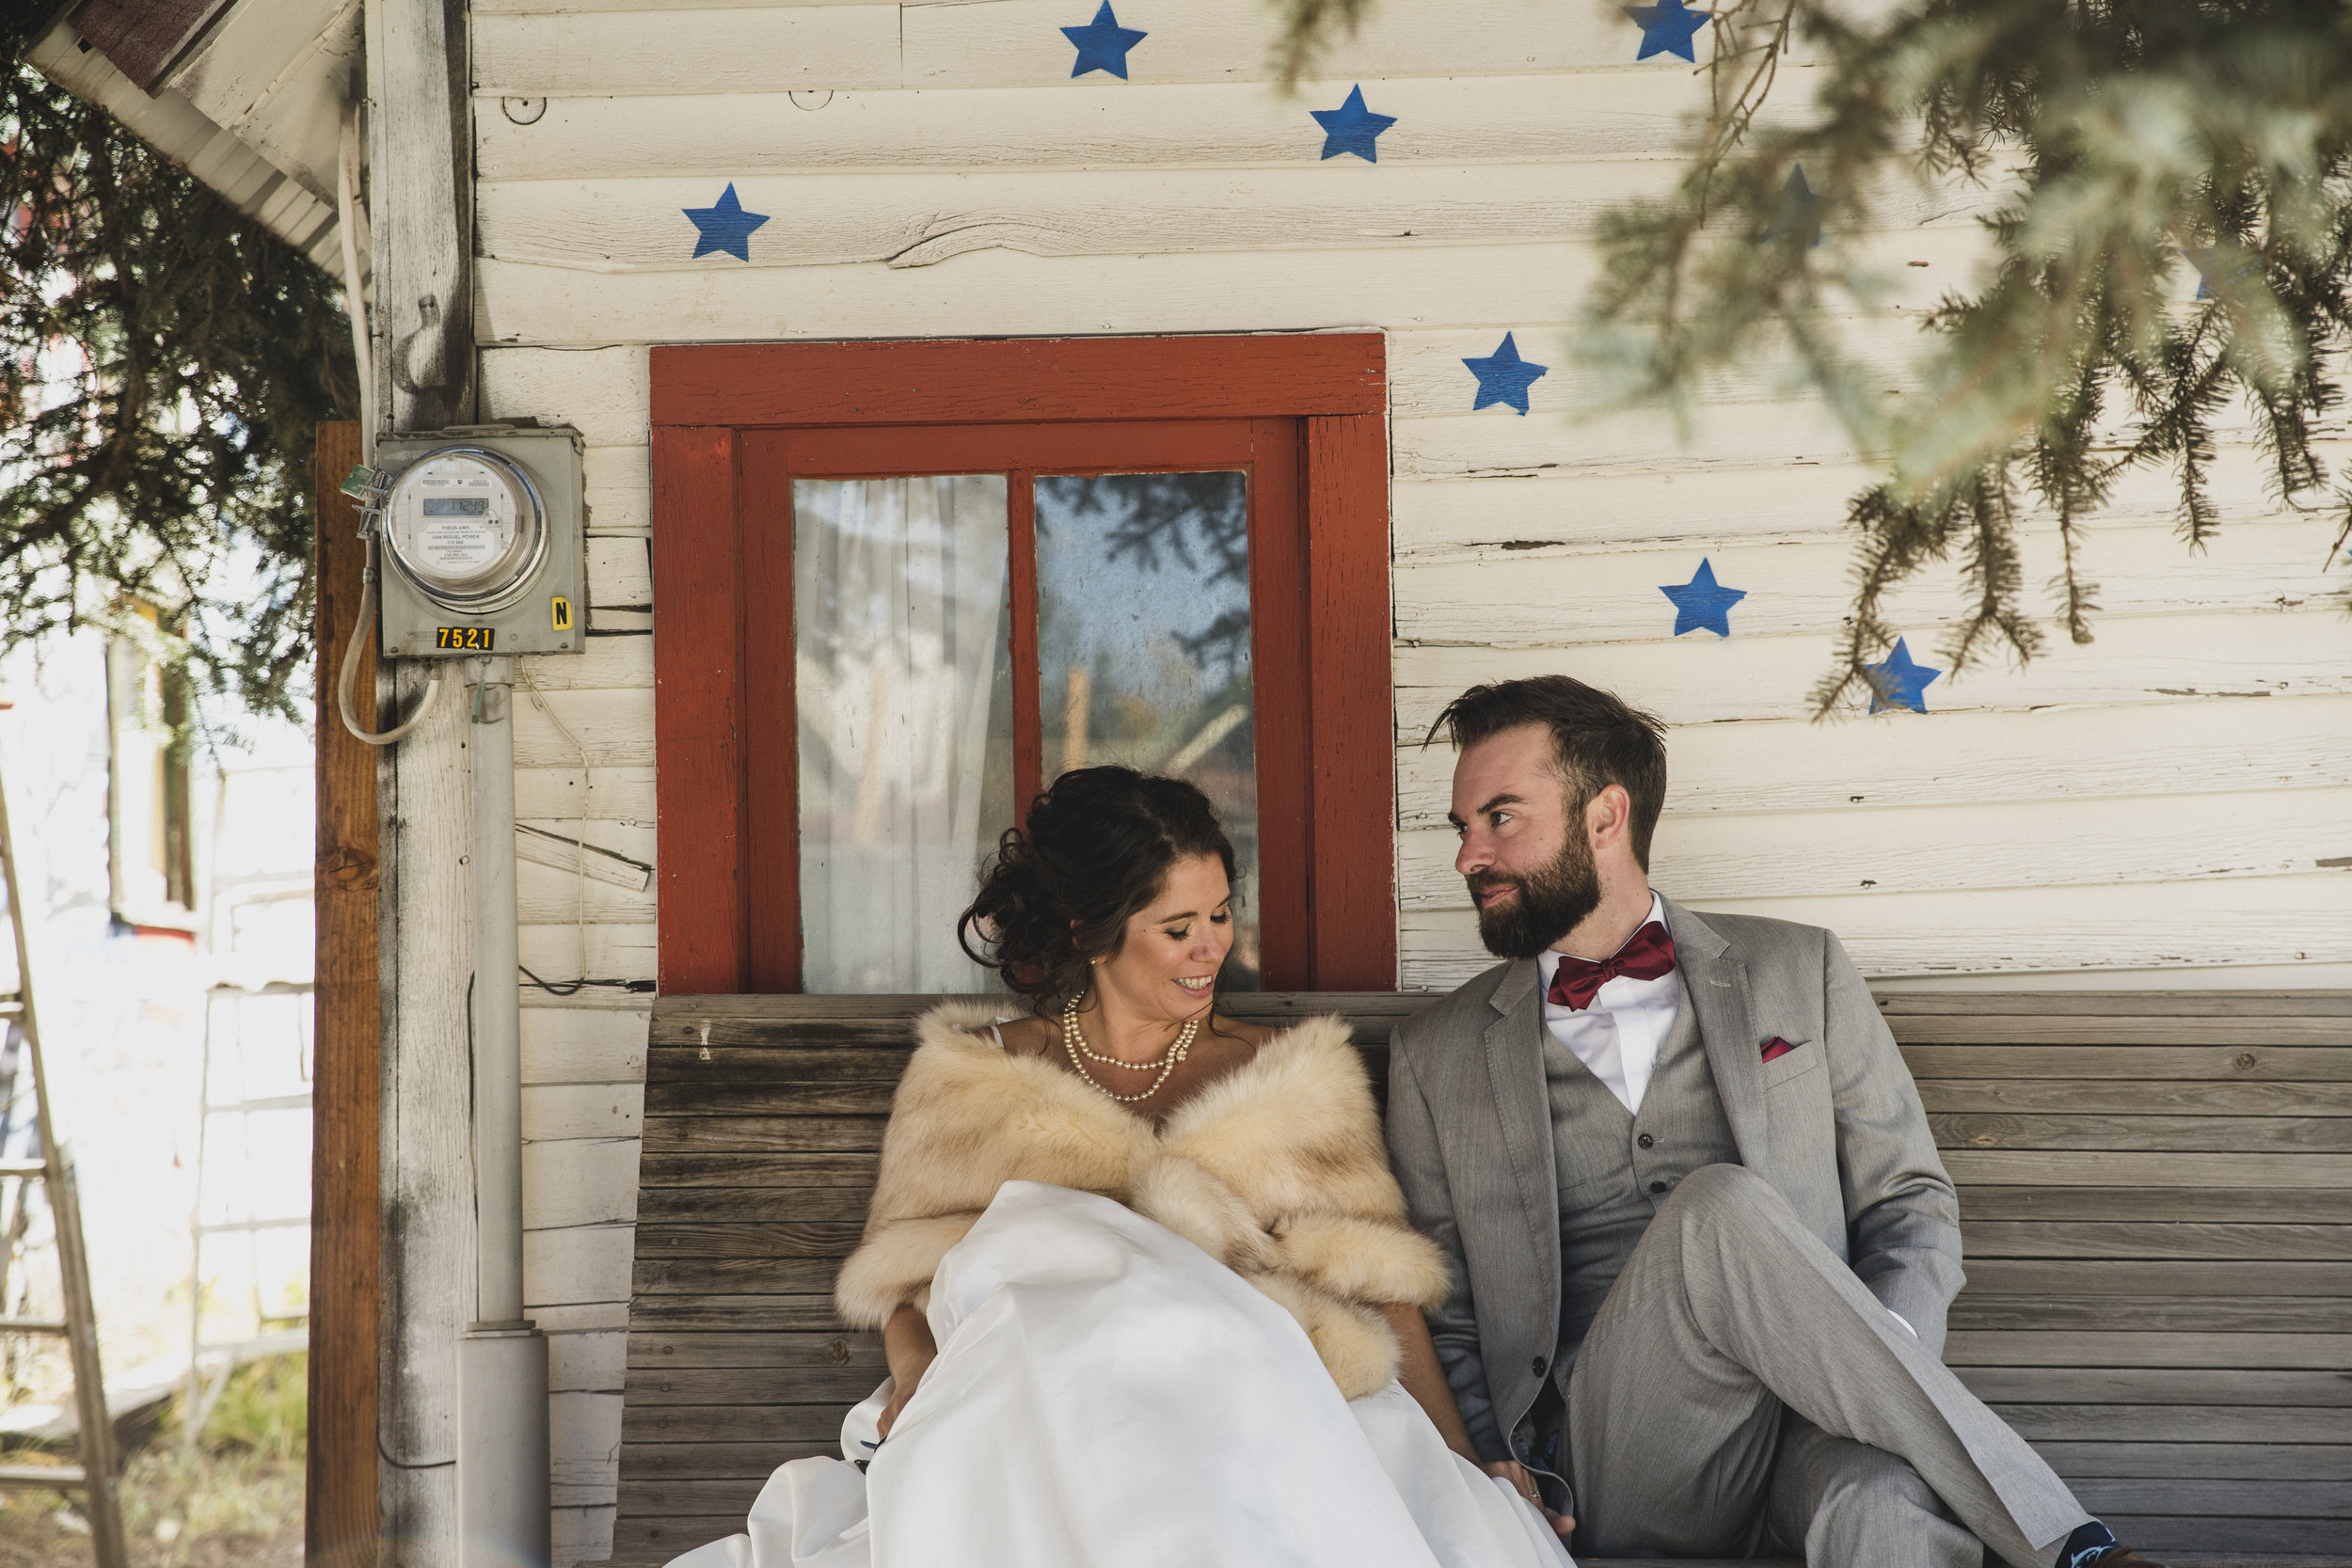 NE-LeahandAshtonphotography-Telluride-Wedding-Photography-8930.jpg